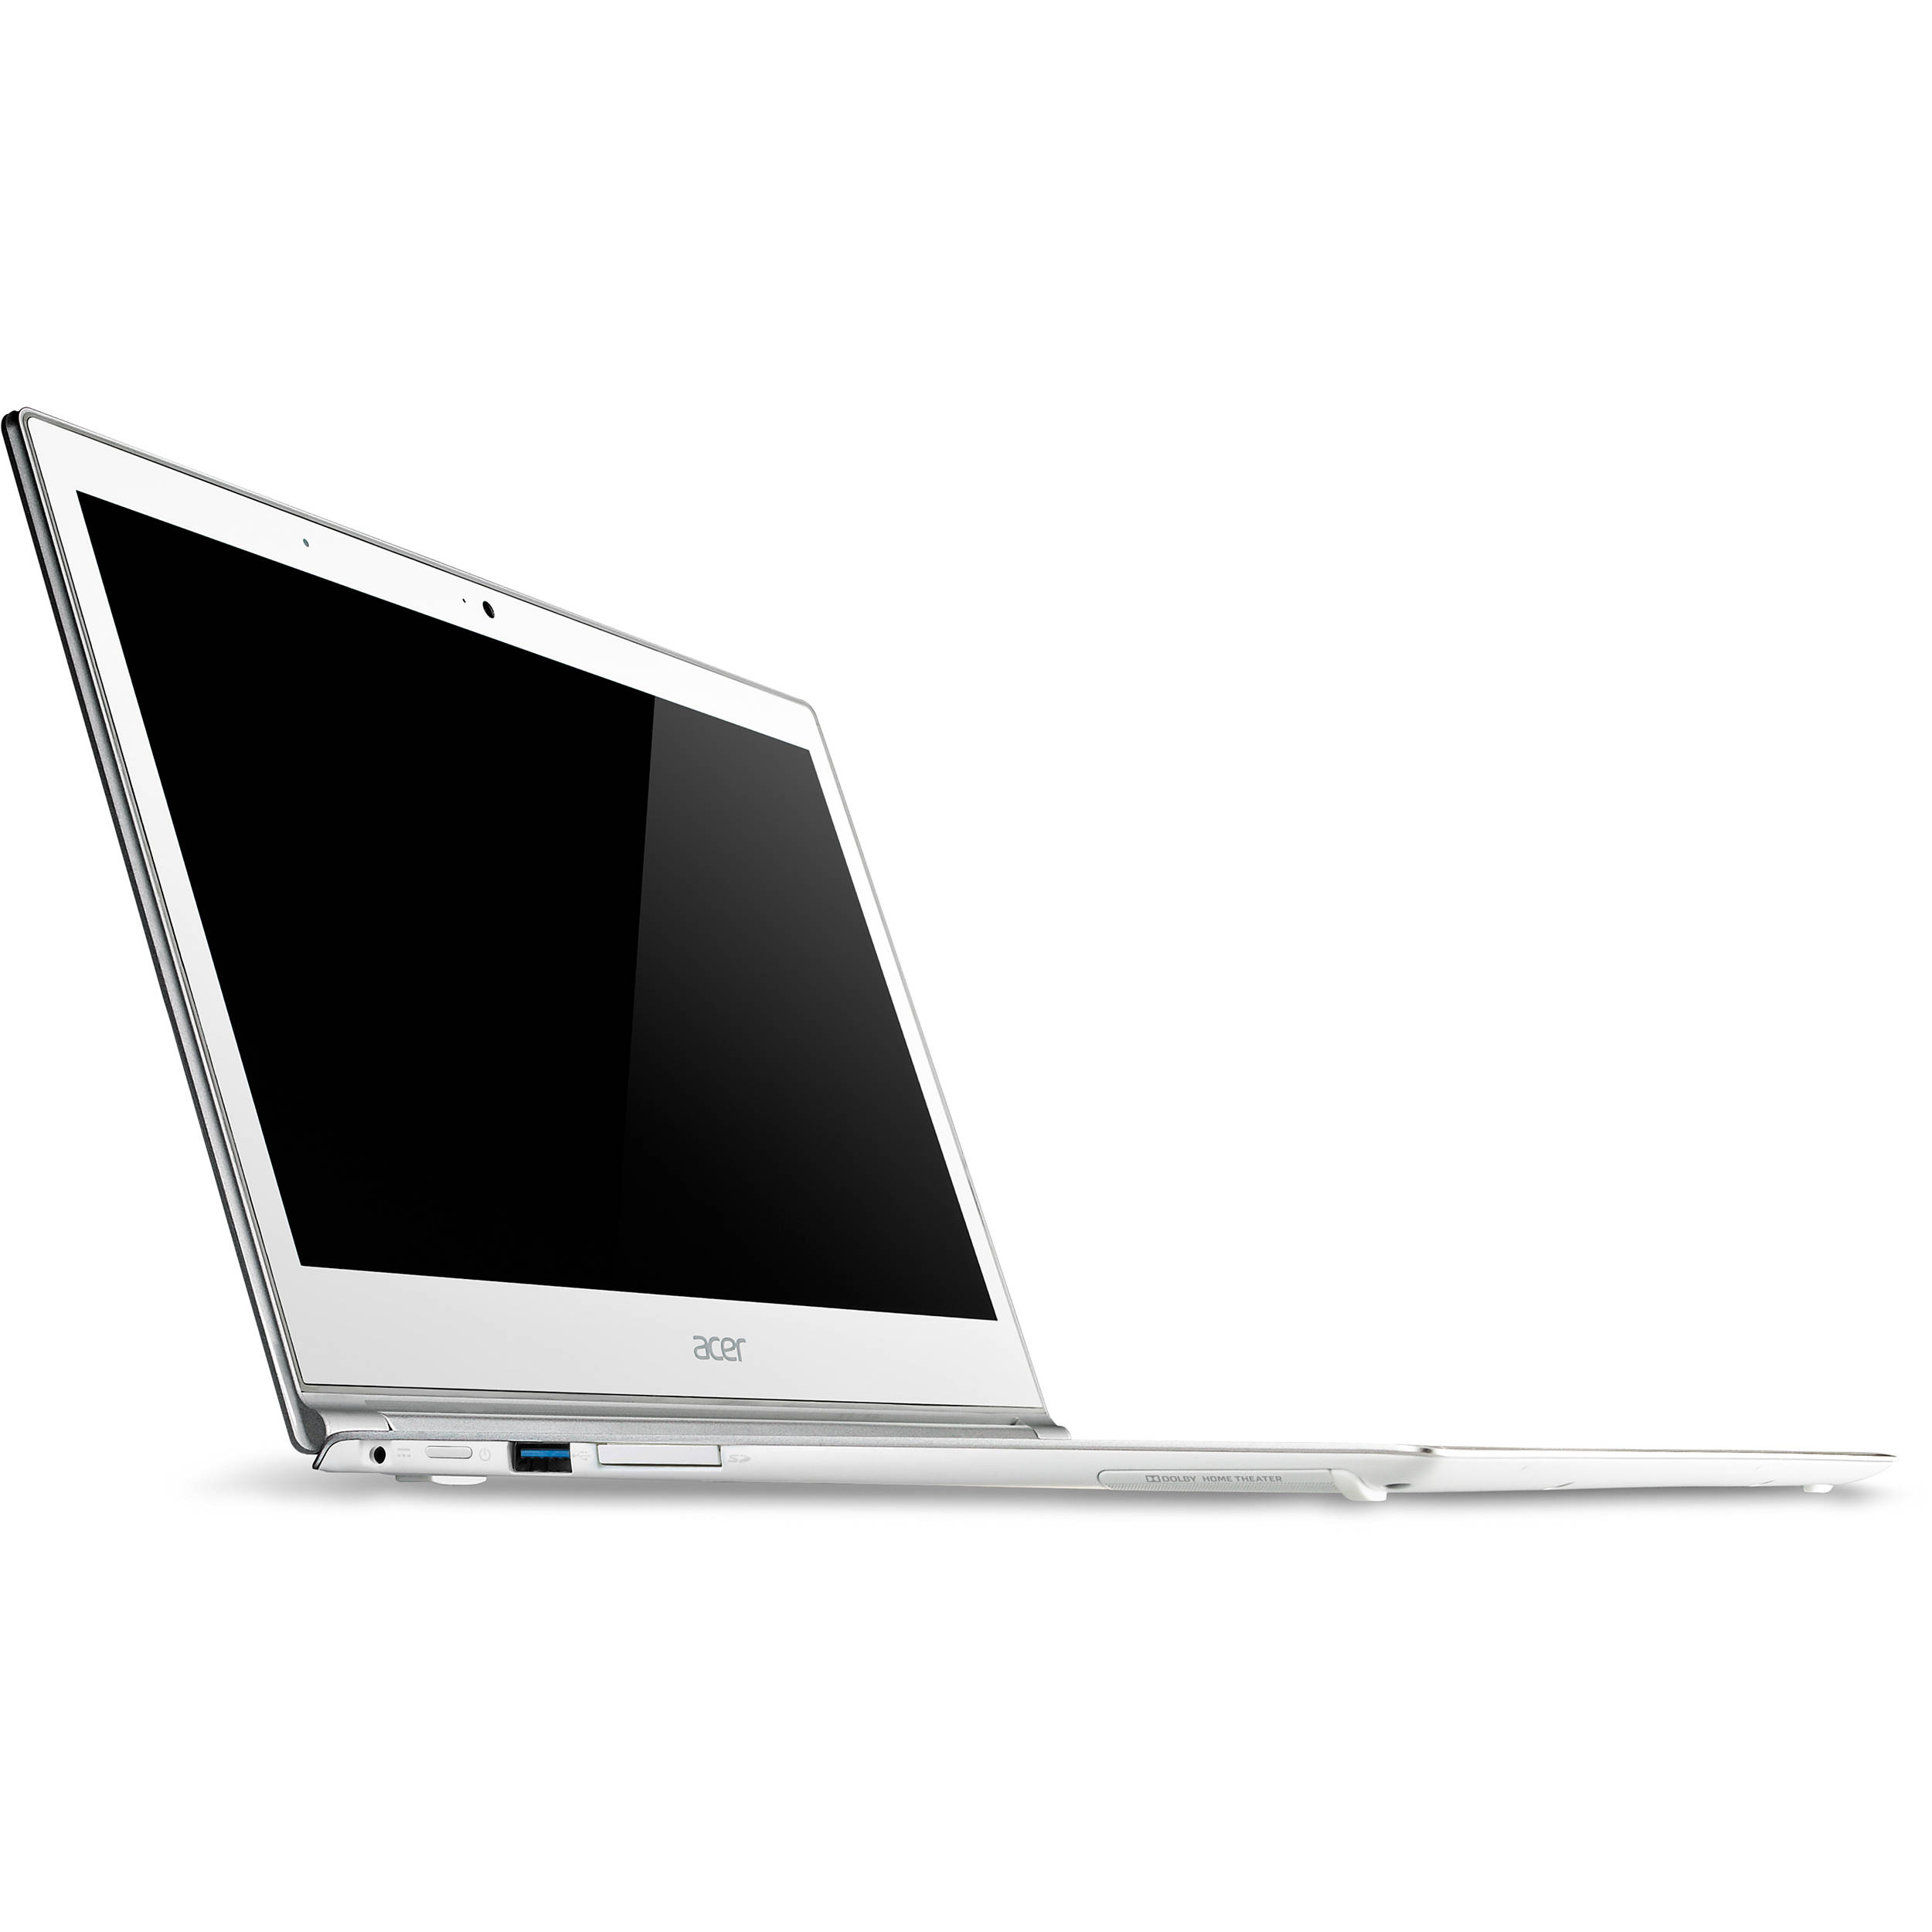 "Acer Aspire S7-392-9439 13.3"" Touchscreen NX.MBKAA.015"